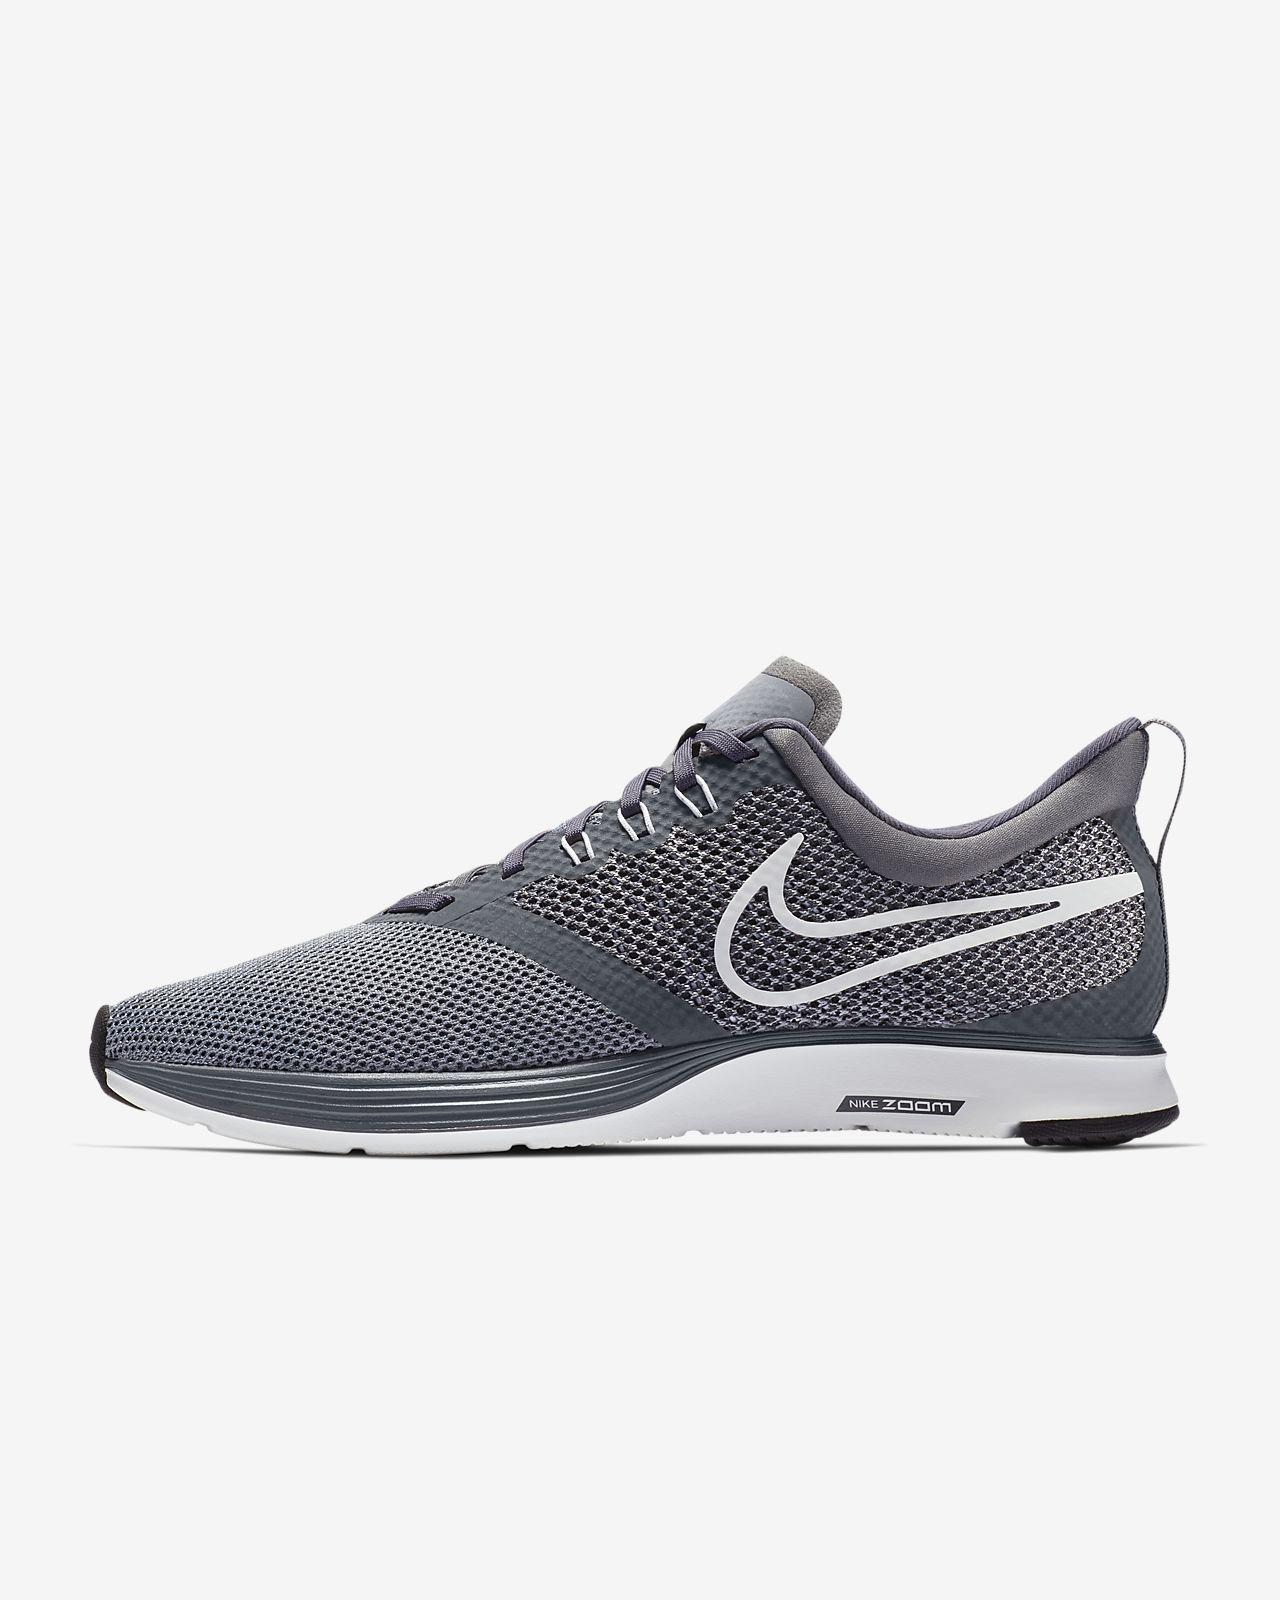 Nike Zoom Strike (AJ0189-001) Mens Running Shoes Black/White/Grey